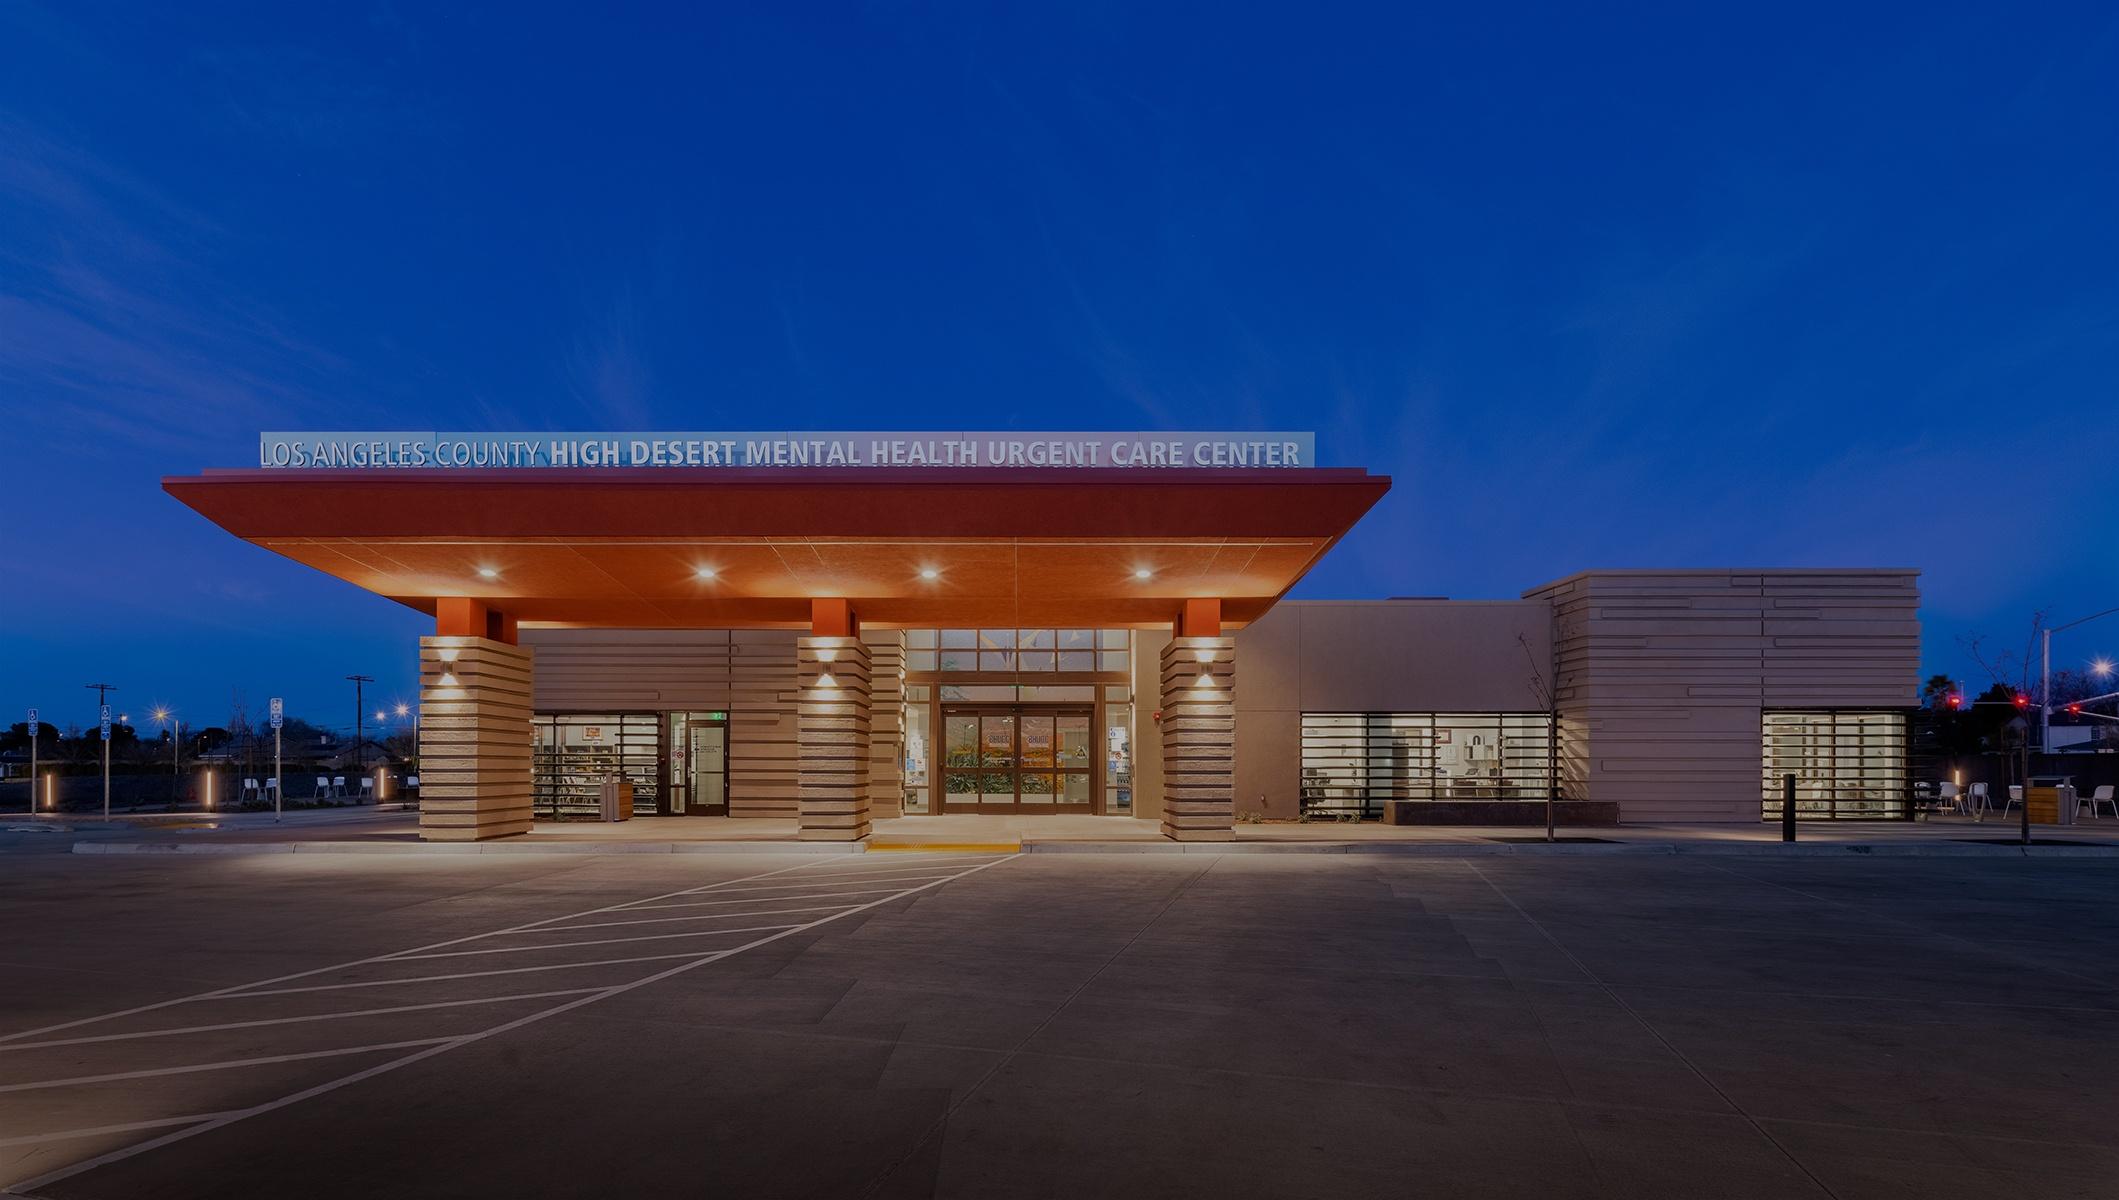 High Desert Mental Health Urgent Care Center